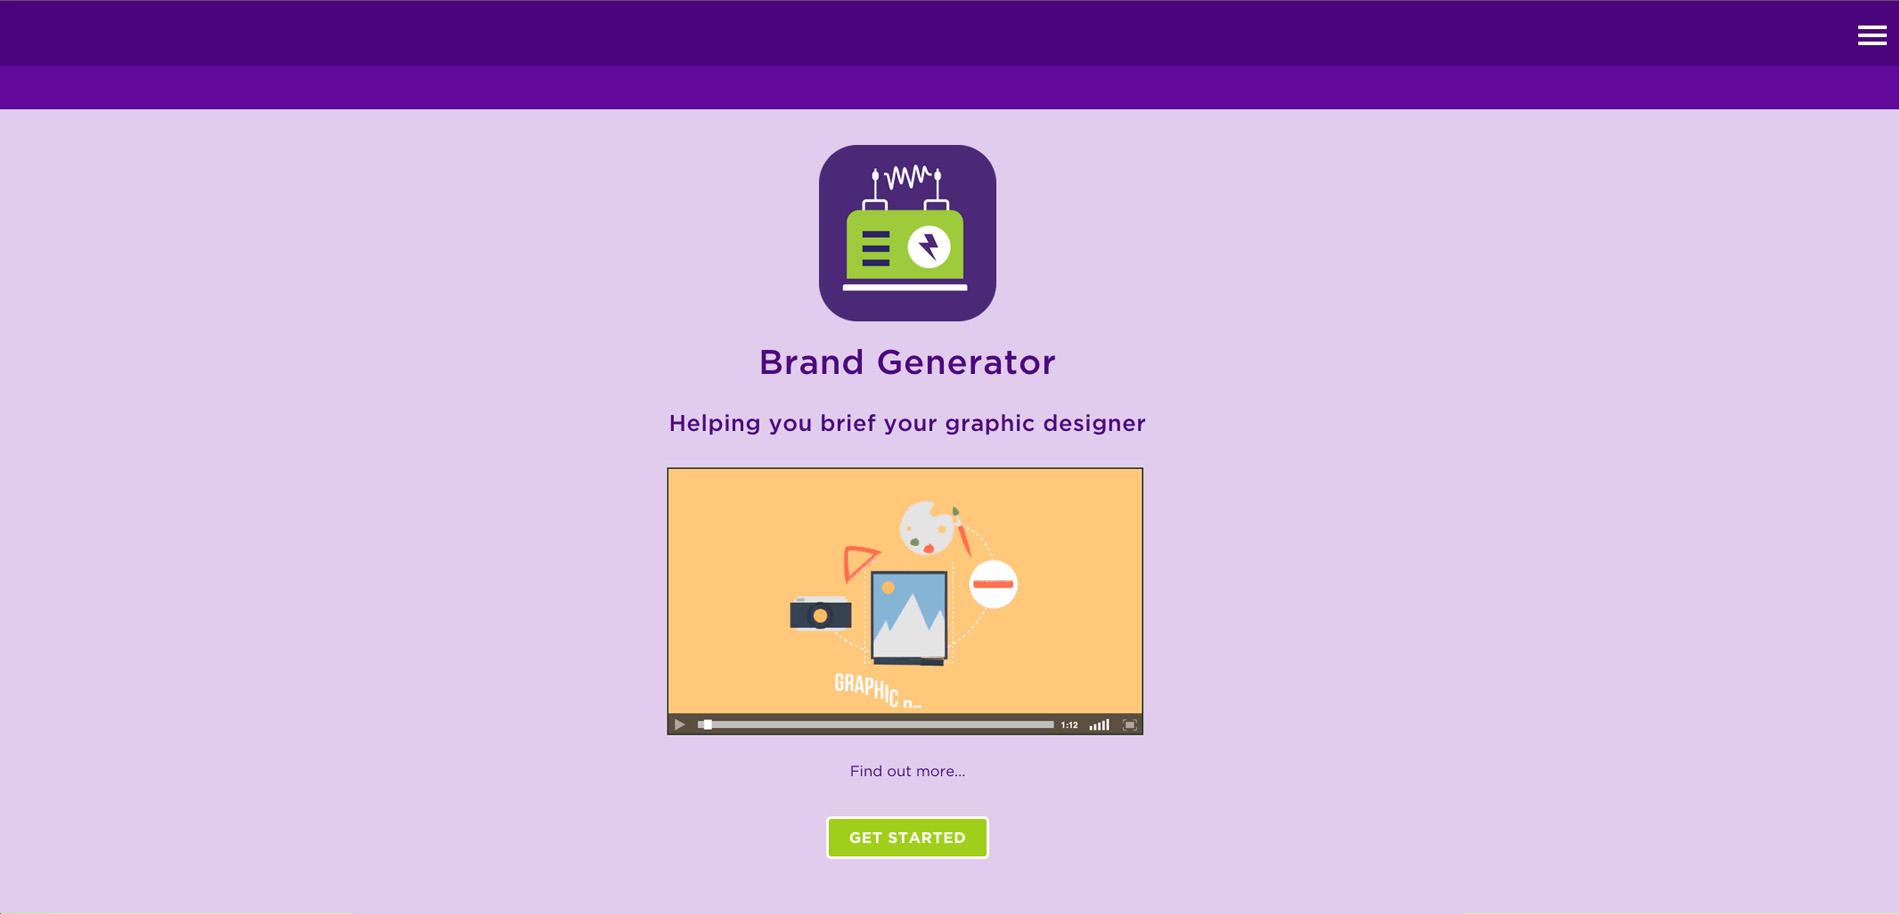 brand-generator